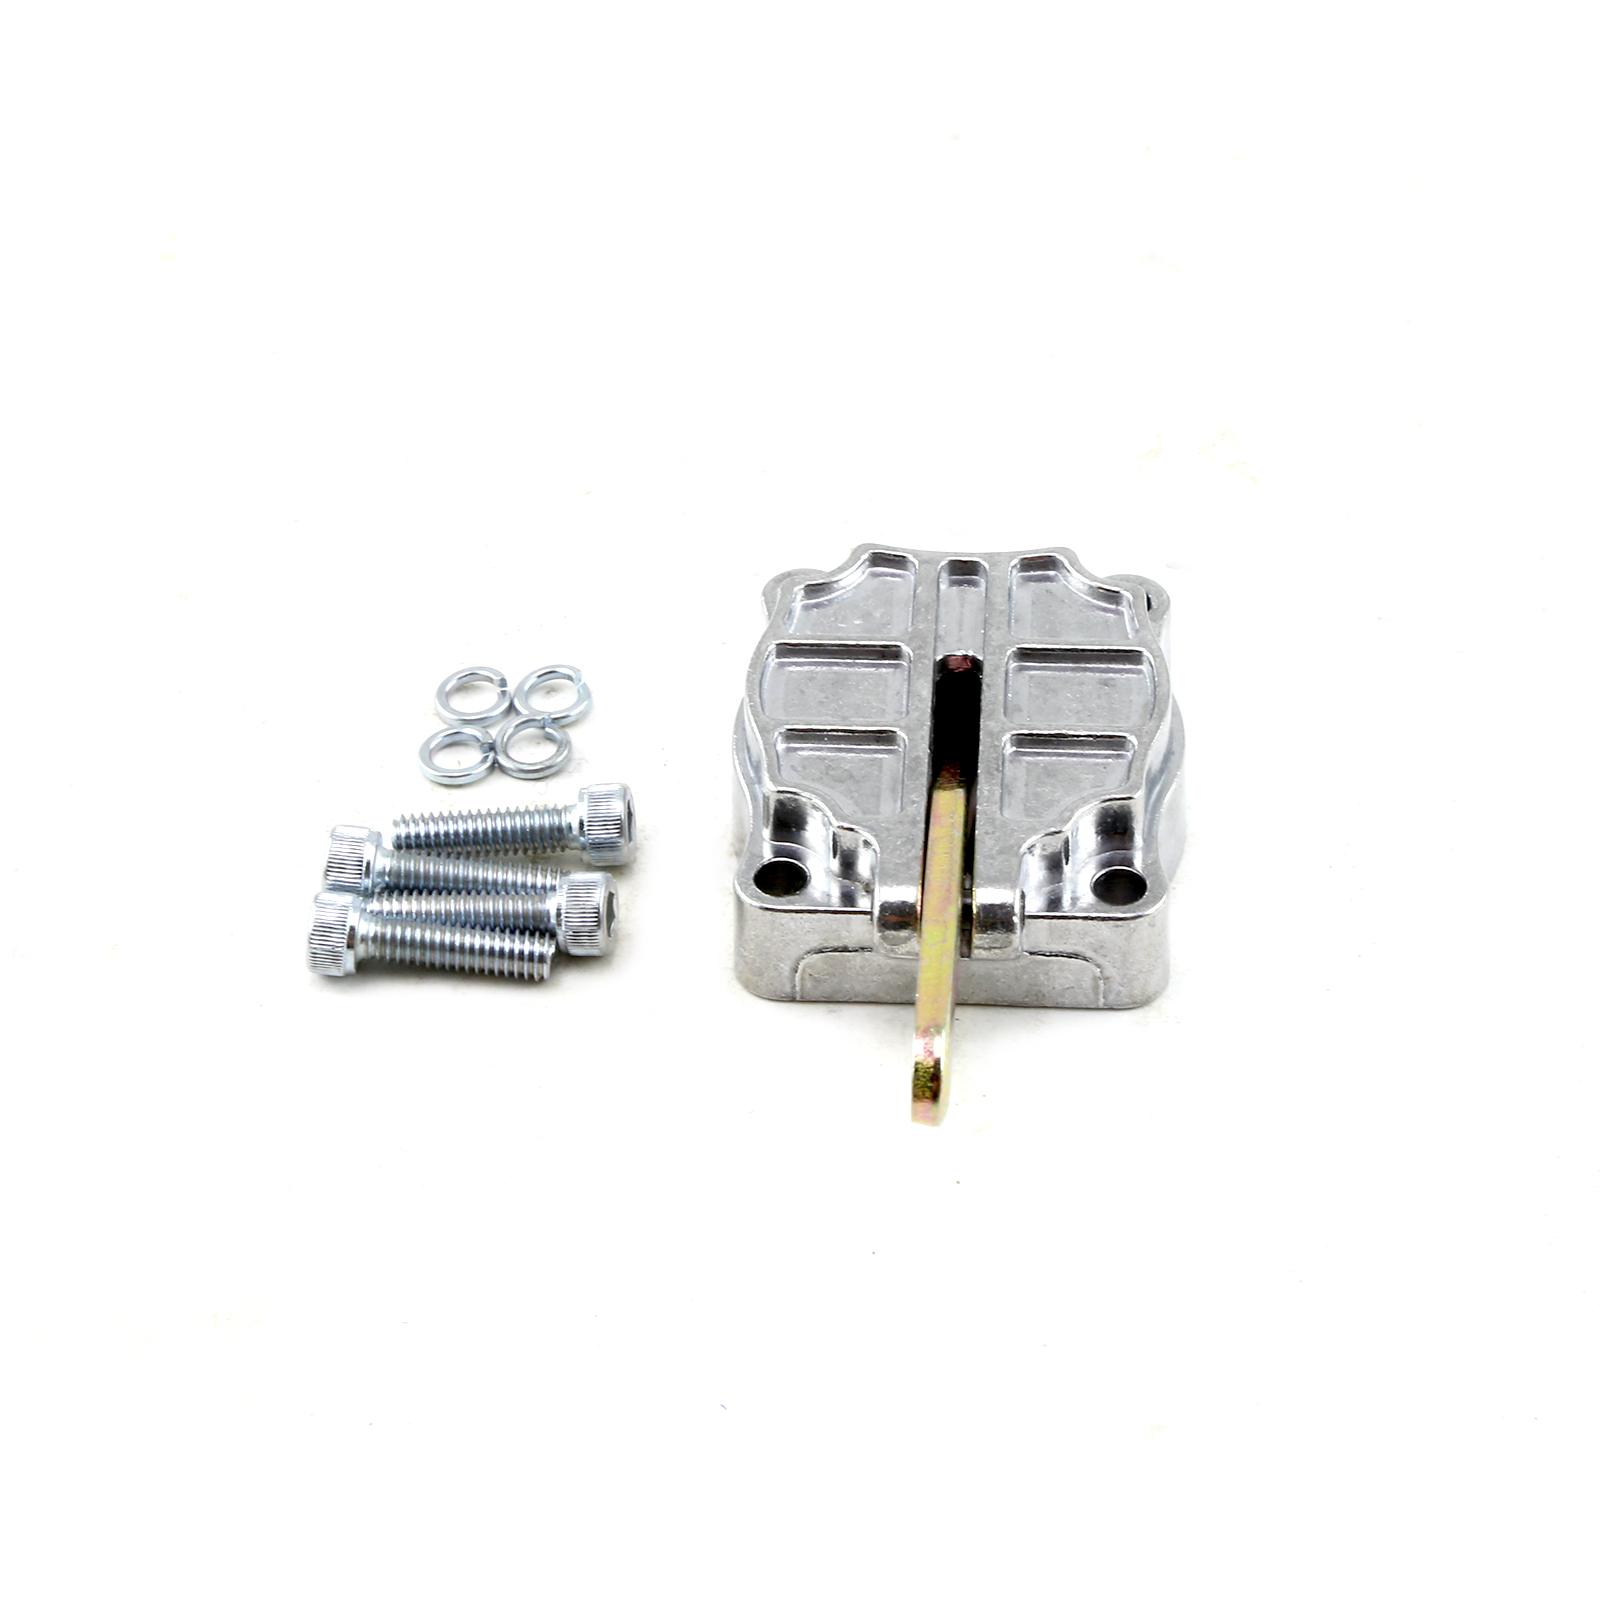 PCE® PCE109.1002 Accelerator Pump Cover With Screws Qft 50cc